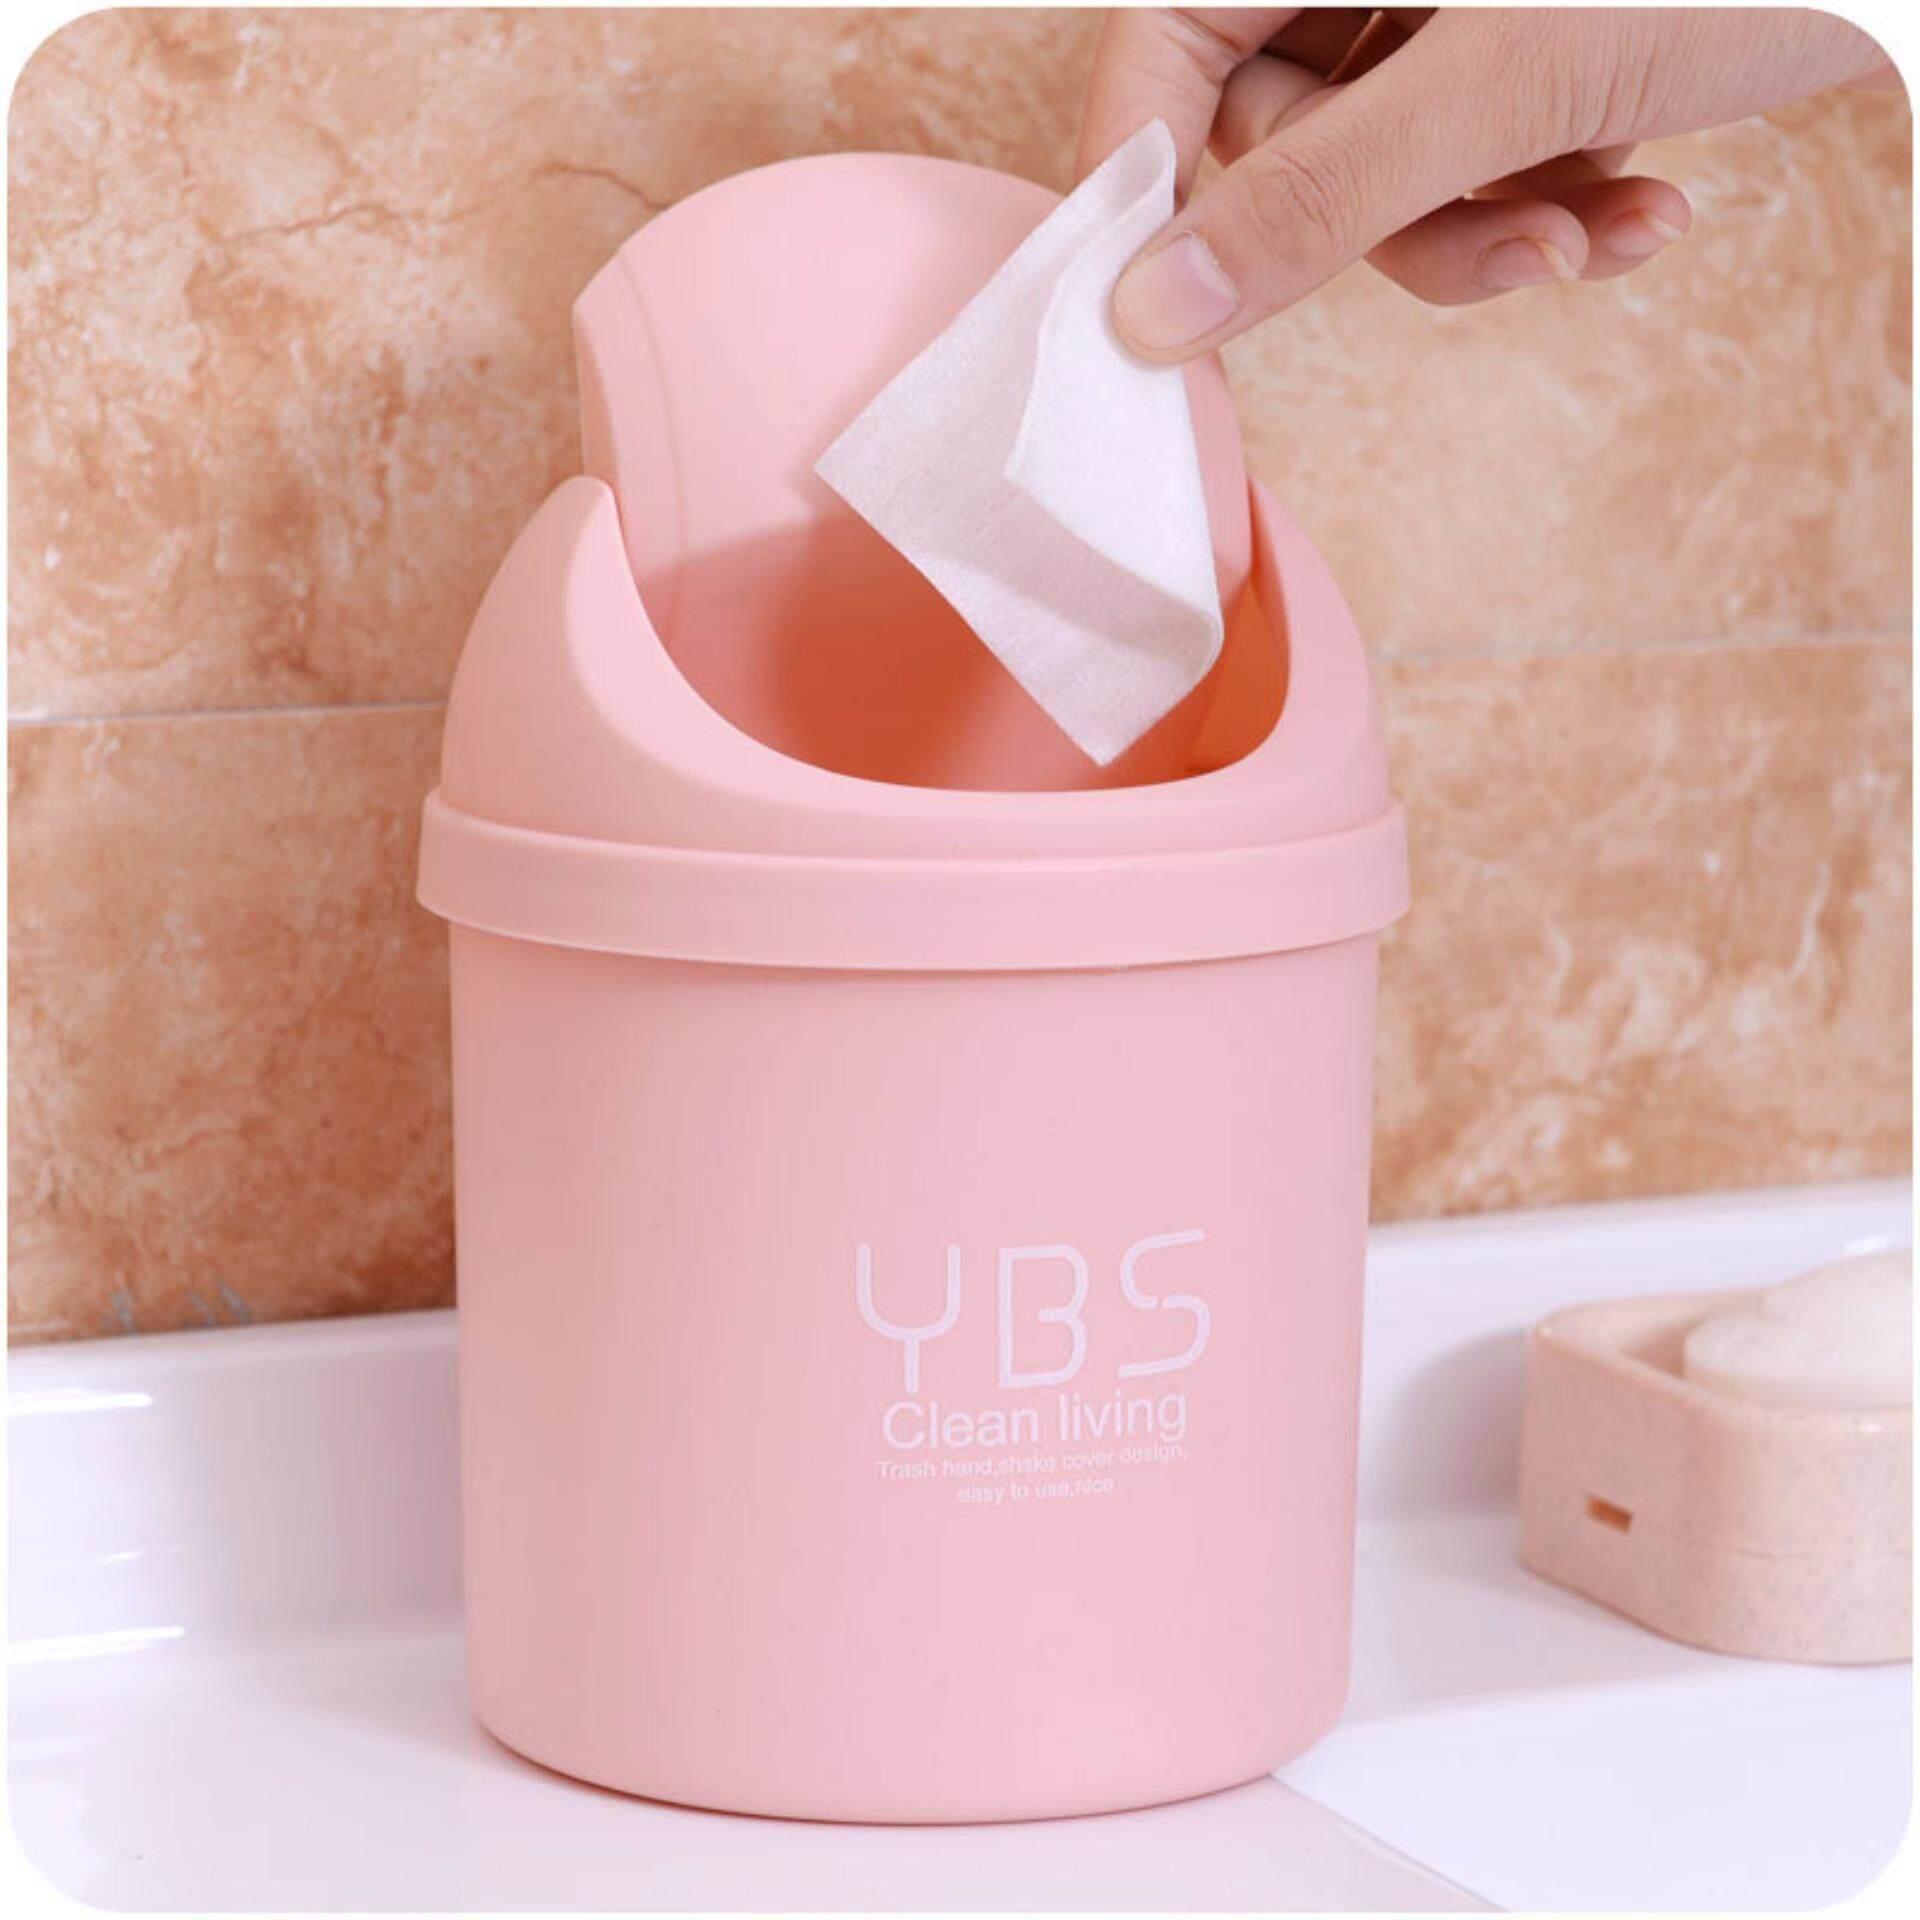 Mini Desktop Trash Can With Lid Desk Small Household Trash Clean Debris Storage (Pink)